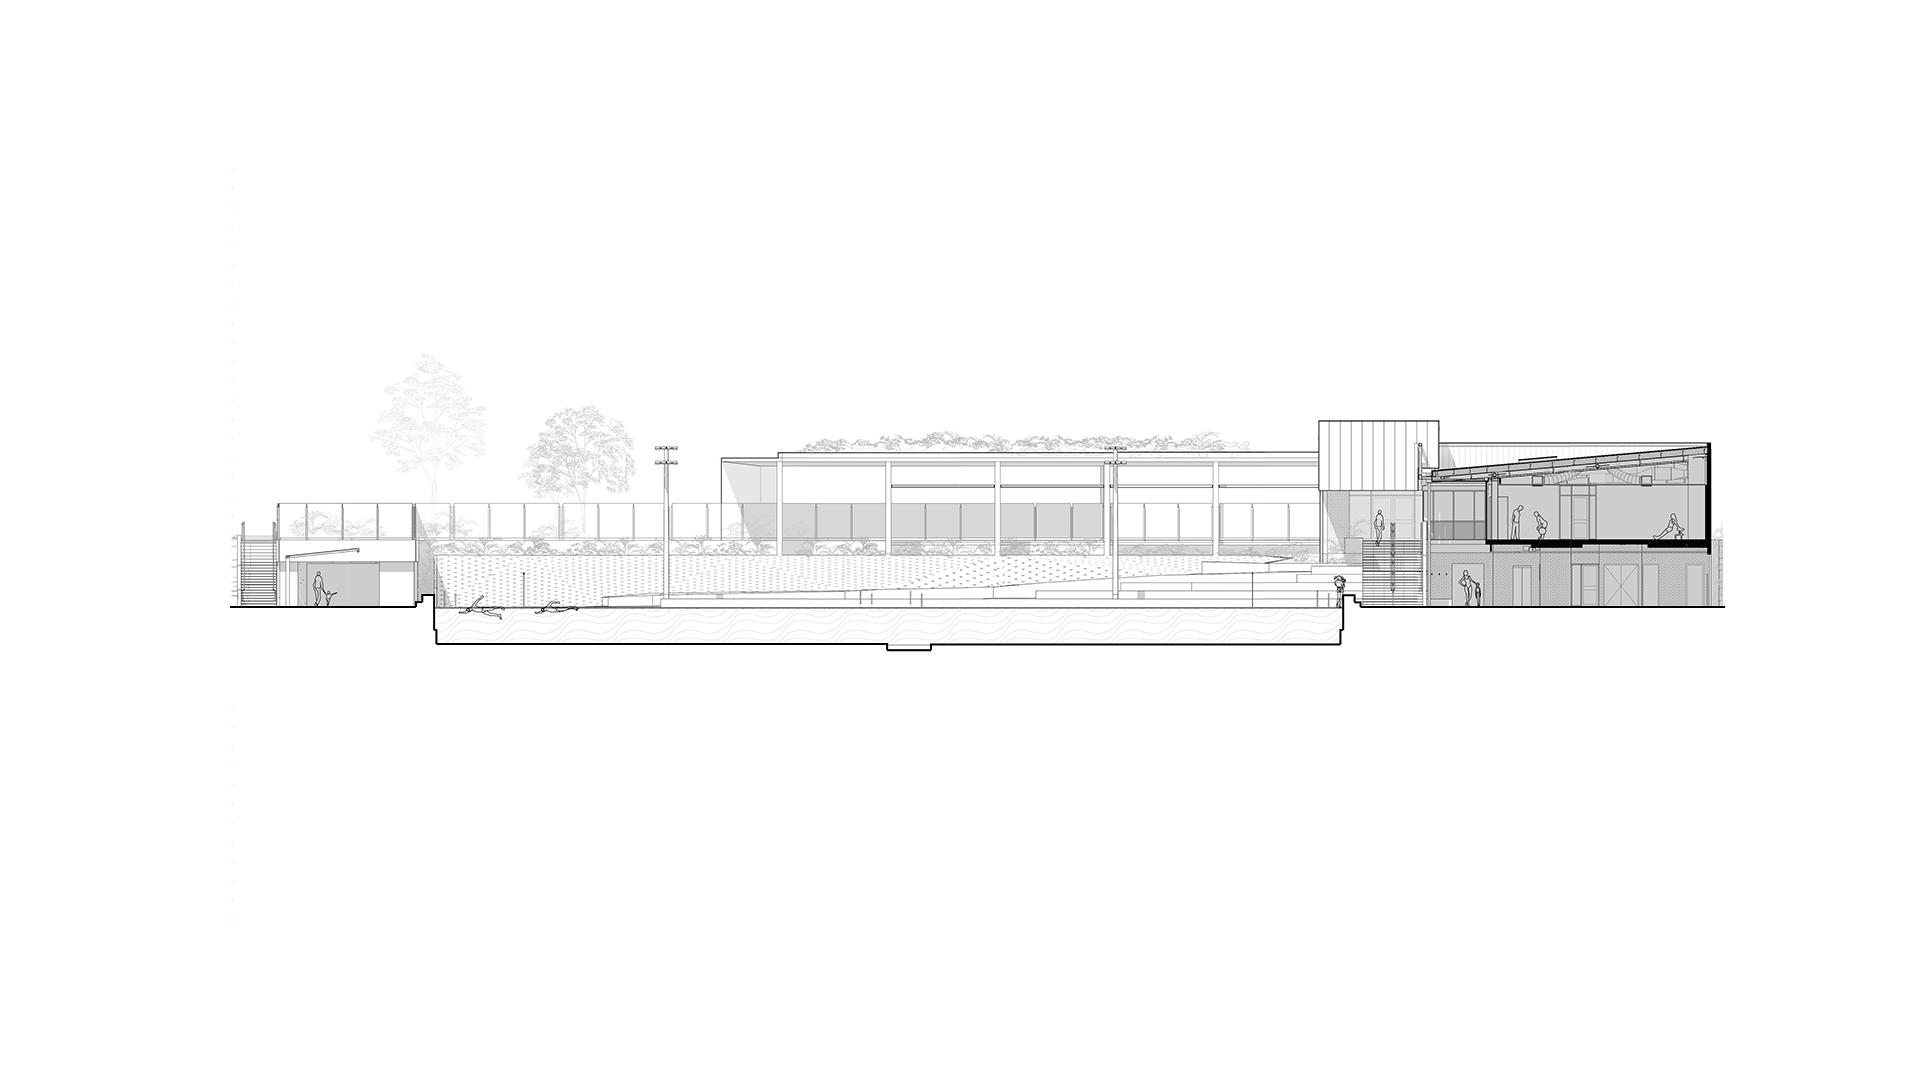 Griffith University Aquatic Centre Section